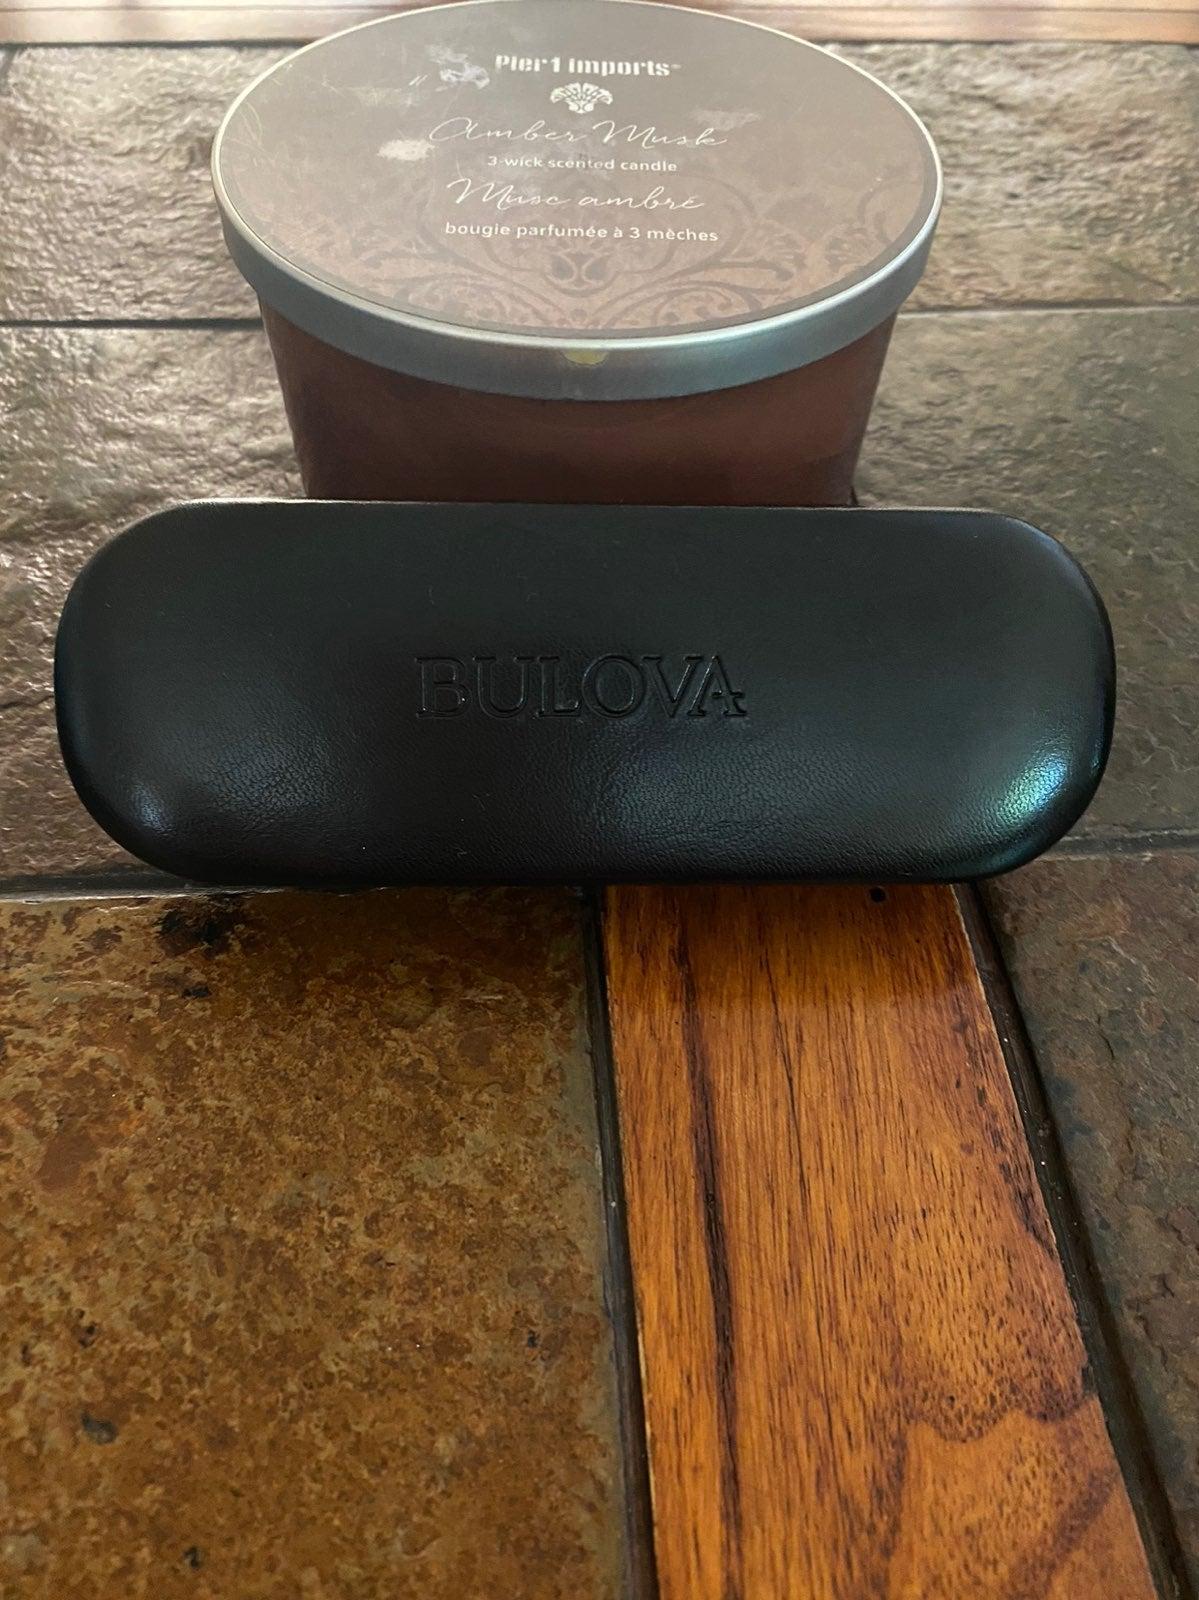 Bulova glass holder case